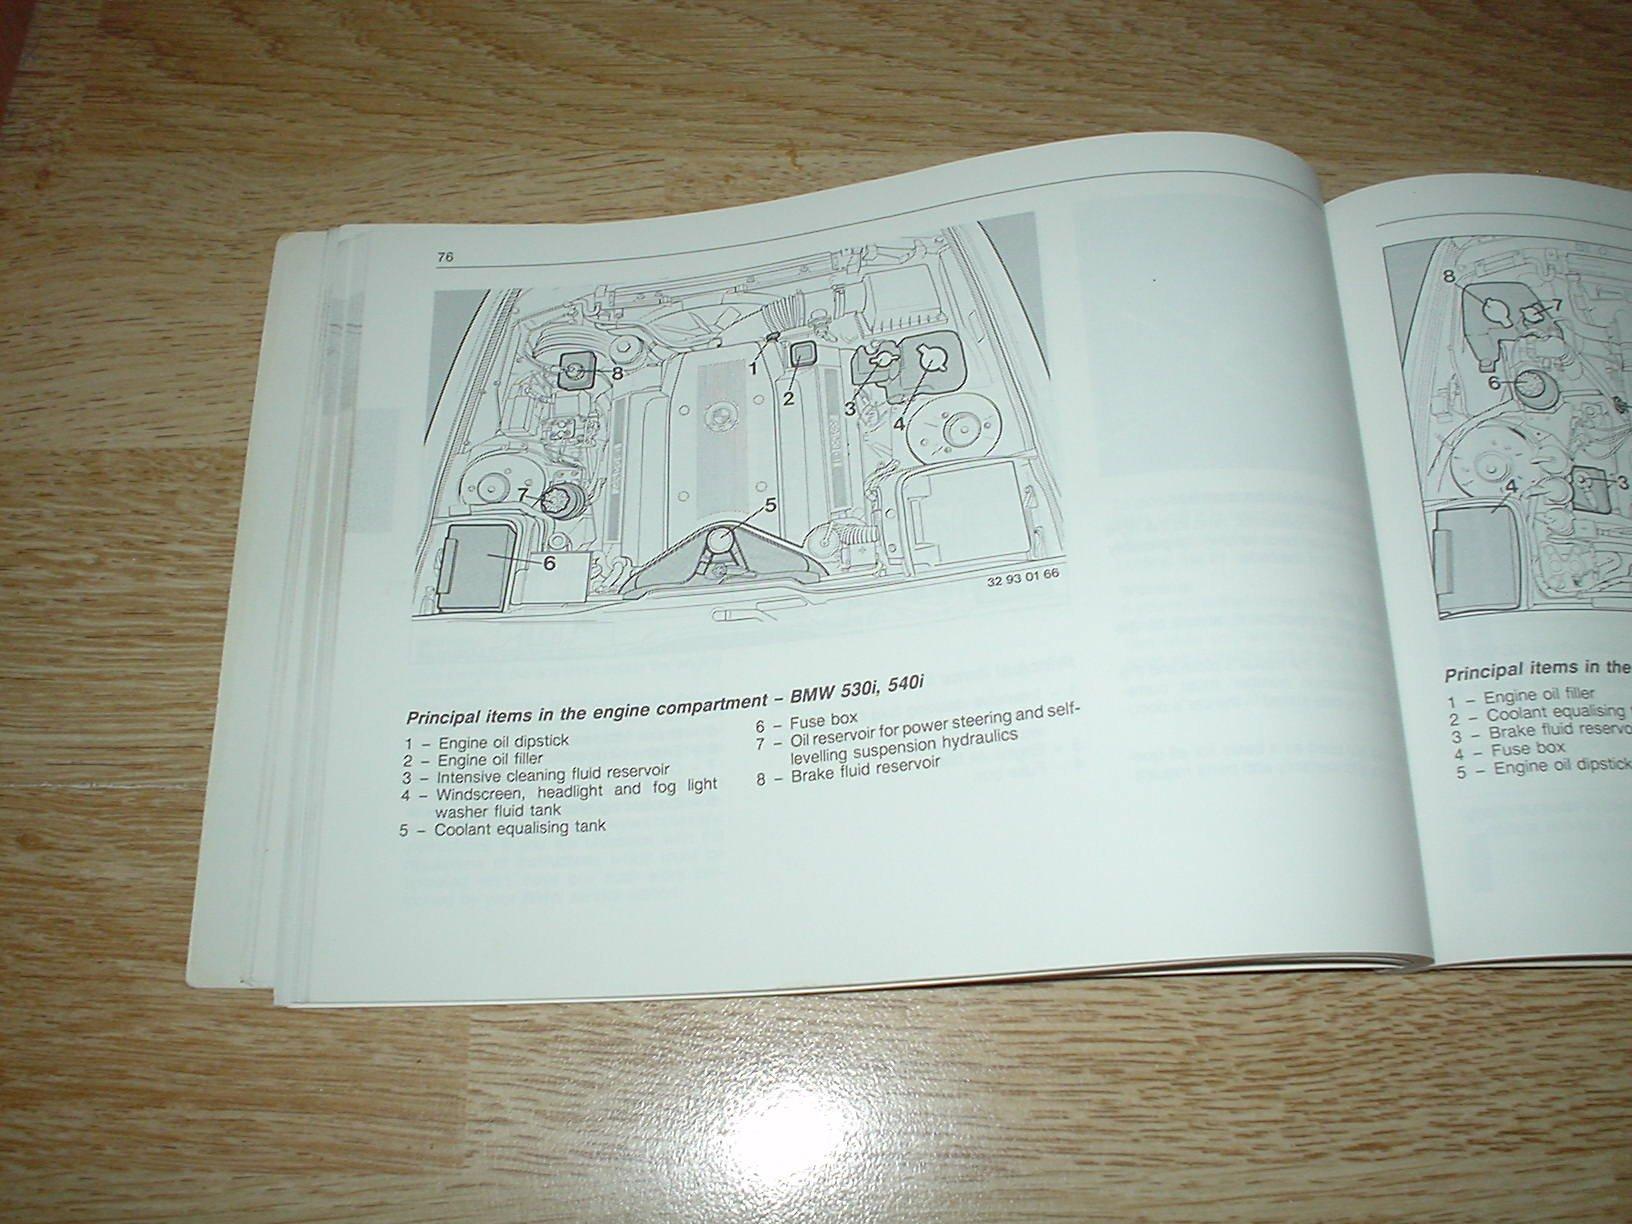 Bmw E34 5 Series Owners Handbook 1988 1996 Saloon Touring 530i Fuse Box 520i 525i 525ix 540i 525tds 520 525 530 540 Td I Ix Tds Hand Book Manual